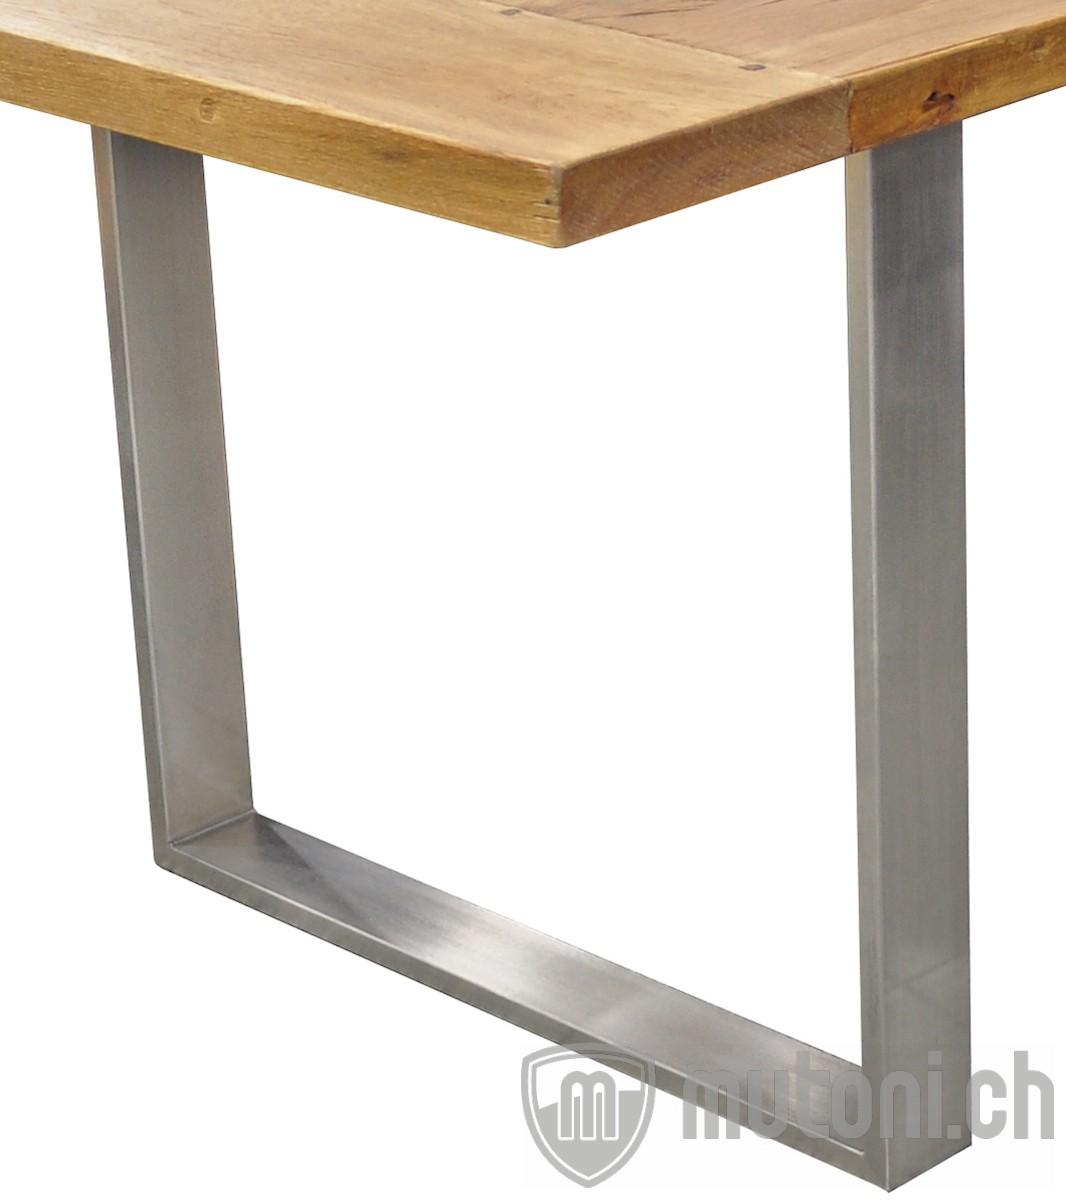 tischgestell edelstahl u form 2er set tischgestelle kanada kanada tischsystem. Black Bedroom Furniture Sets. Home Design Ideas